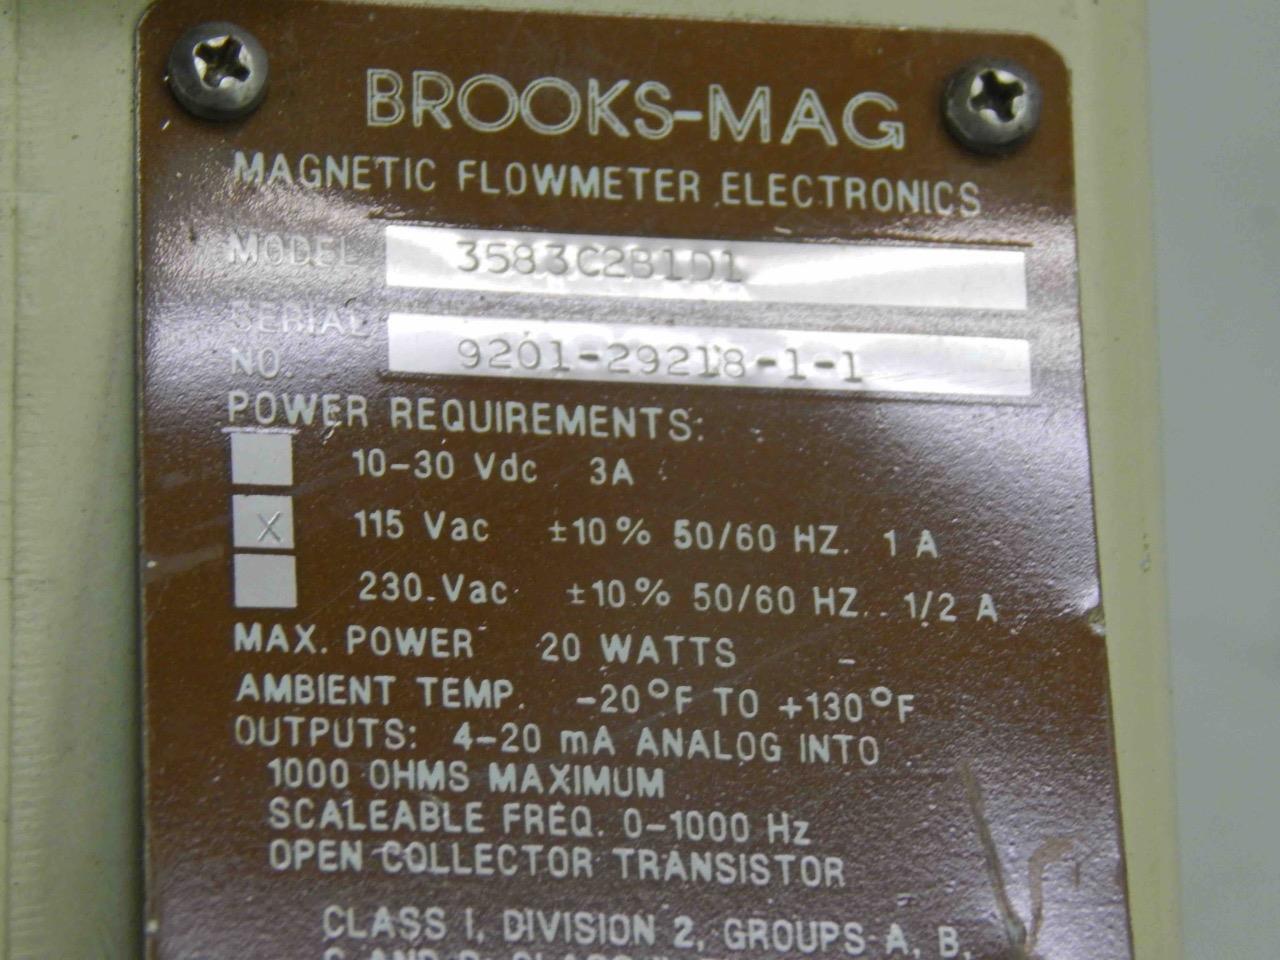 32 32 32 Brooks 3583C2B1D1 Caudalímetro magnético Mag 3580 Series 115Vac 5a879b